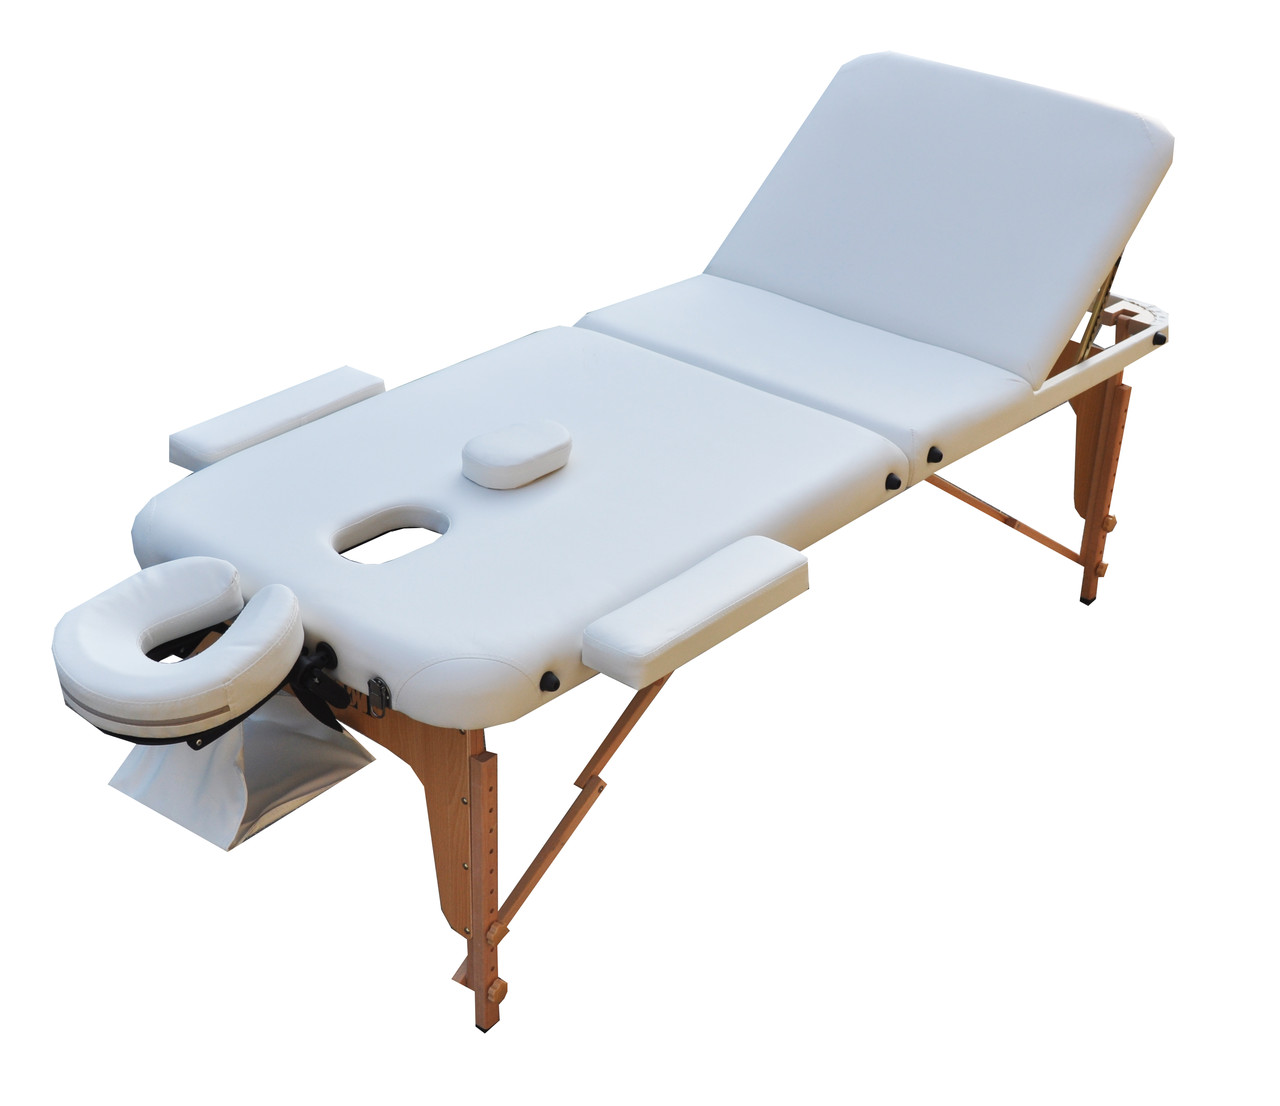 Массажный стол трехсекционный ZENET  ZET-1047 WHITE размер М ( 185*70*61)